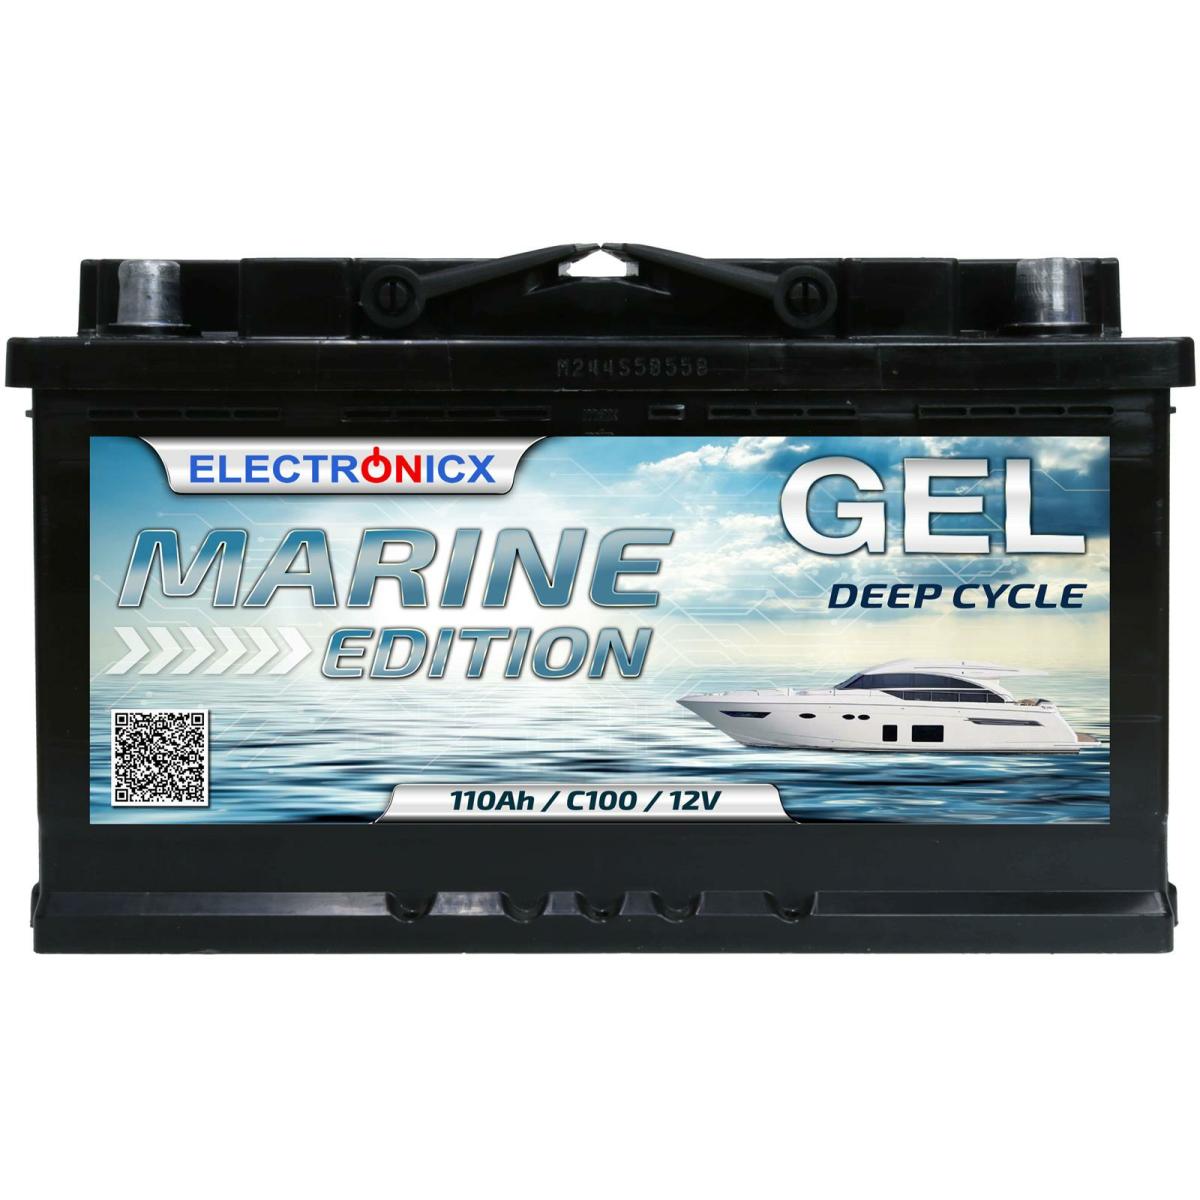 GEL Batterie 110AH Electronicx Marine Edition Boot Schiff Versorgungsbatterie 12V Akku Deep Bootsbatterie Autobatterie Solarbatterie Solar Batterien…